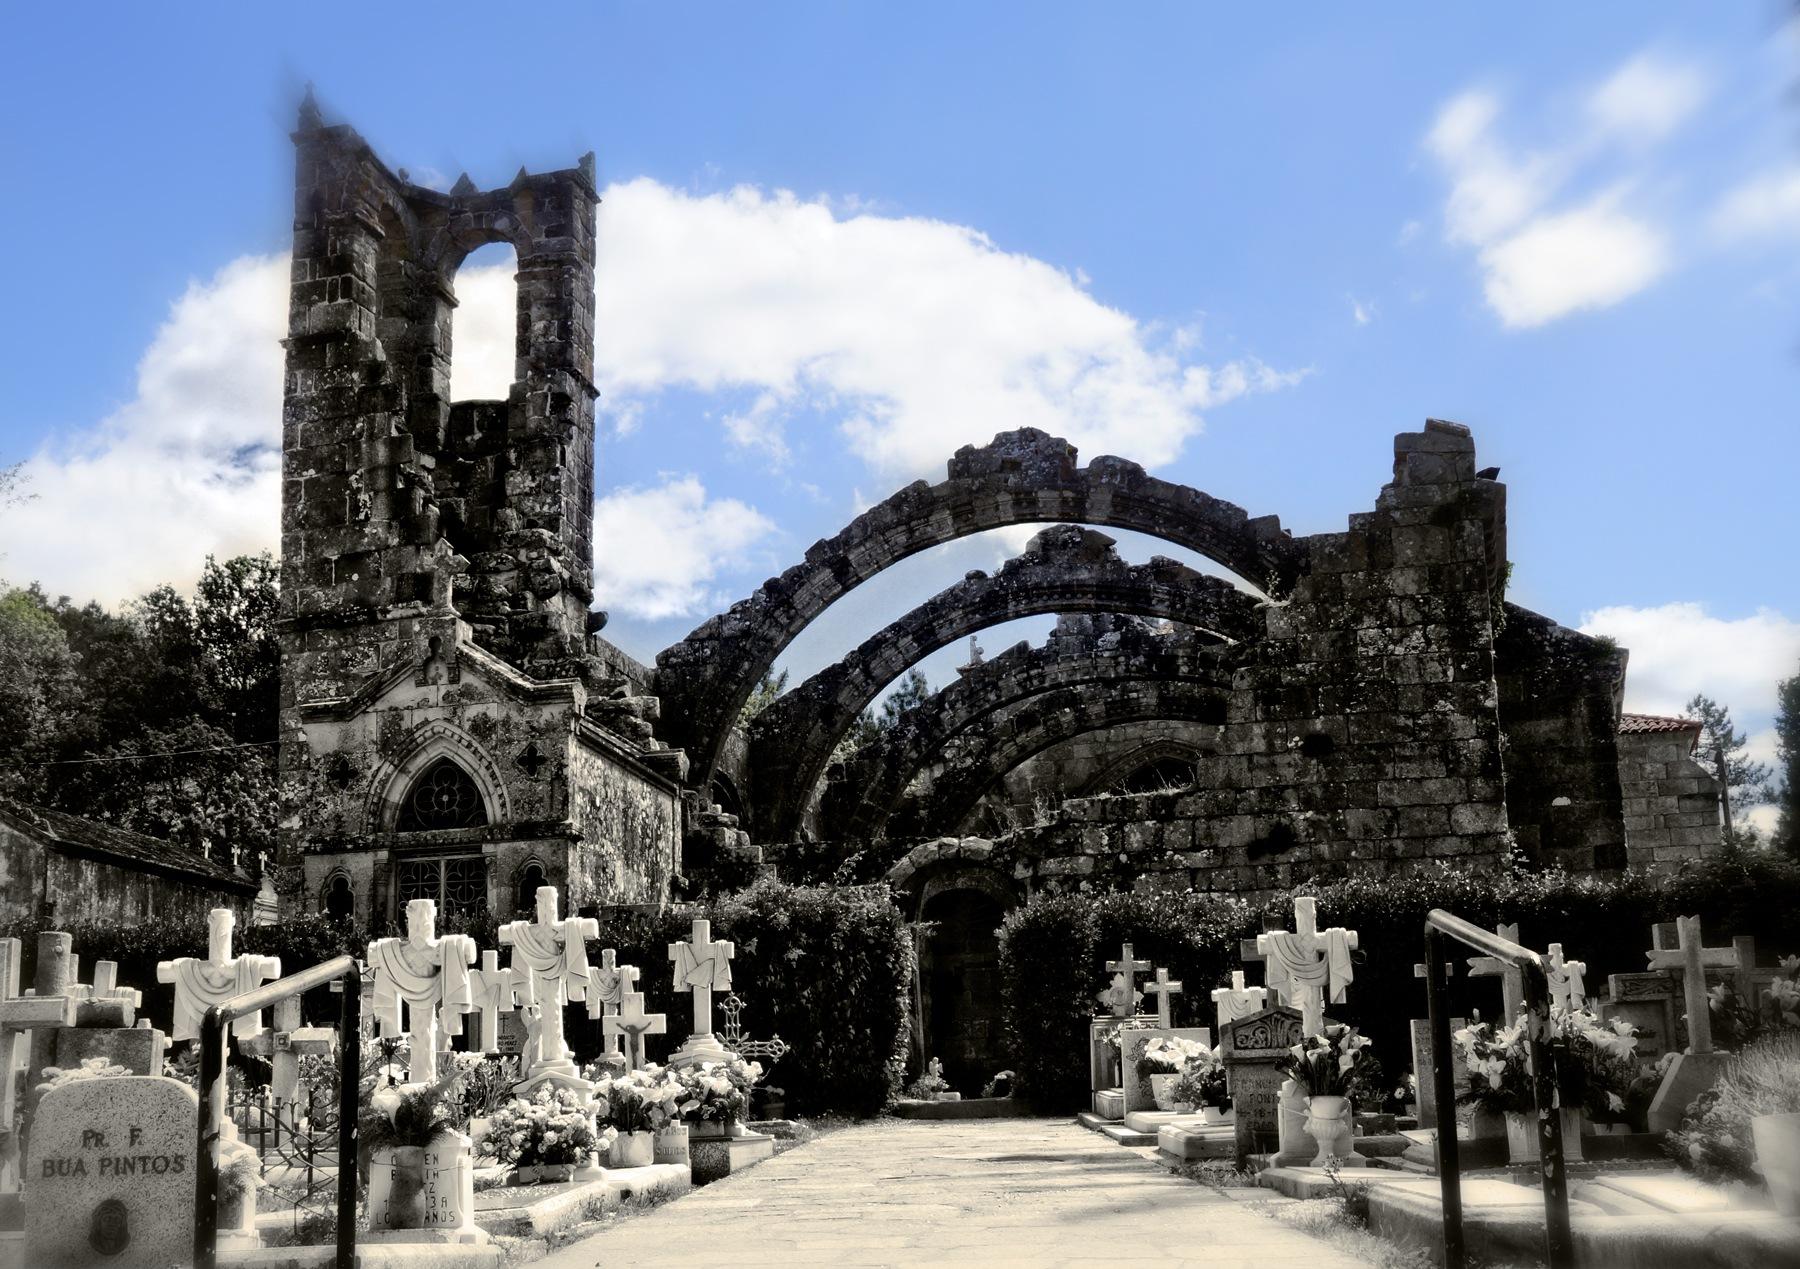 Cementiri by Pilar